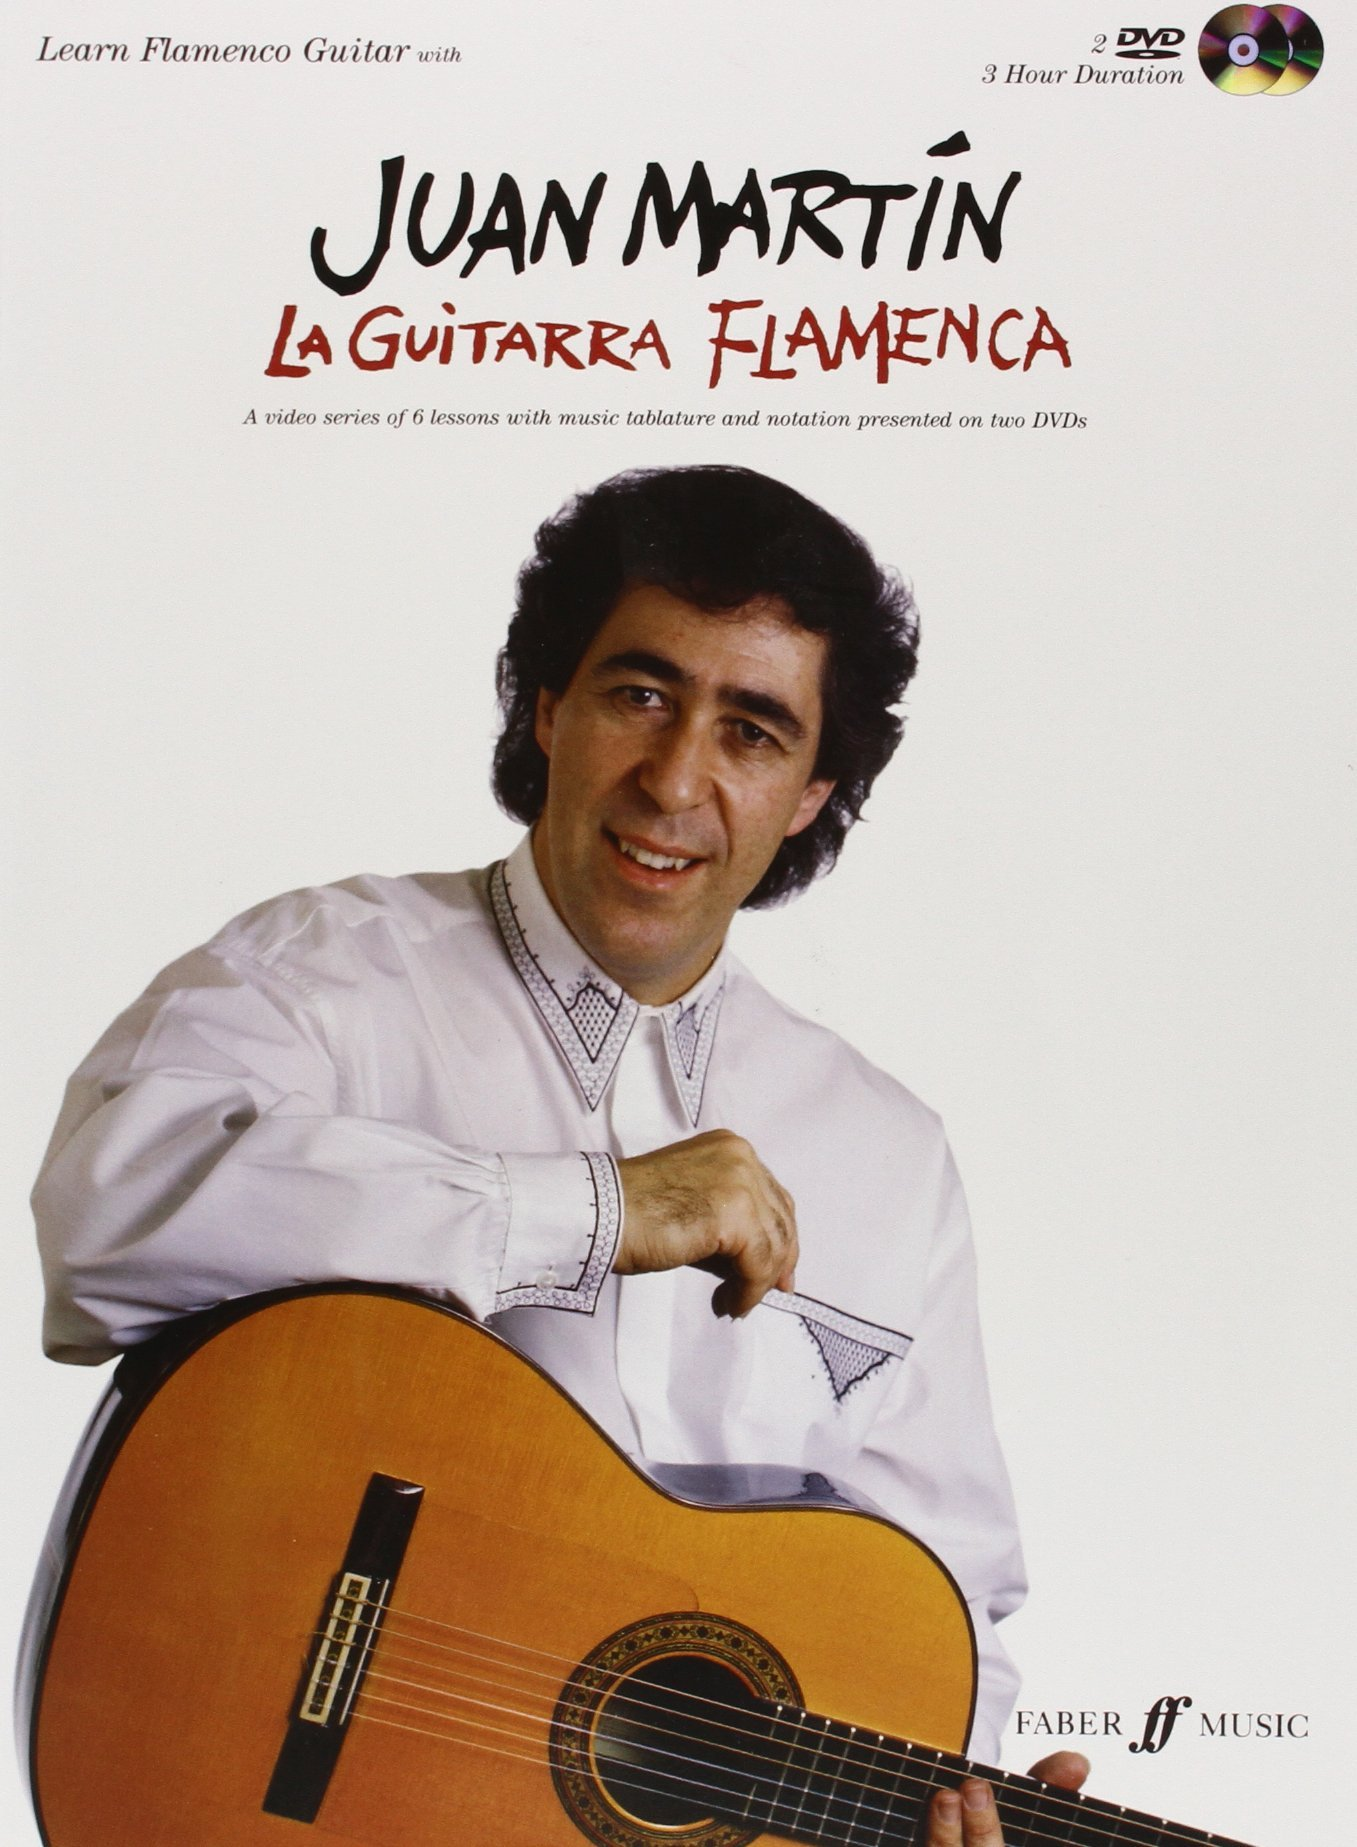 La Guitarra Flamenca Faber Edition by Juan Martin 27-Oct-2008 Paperback: Amazon.es: Juan Martin: Libros